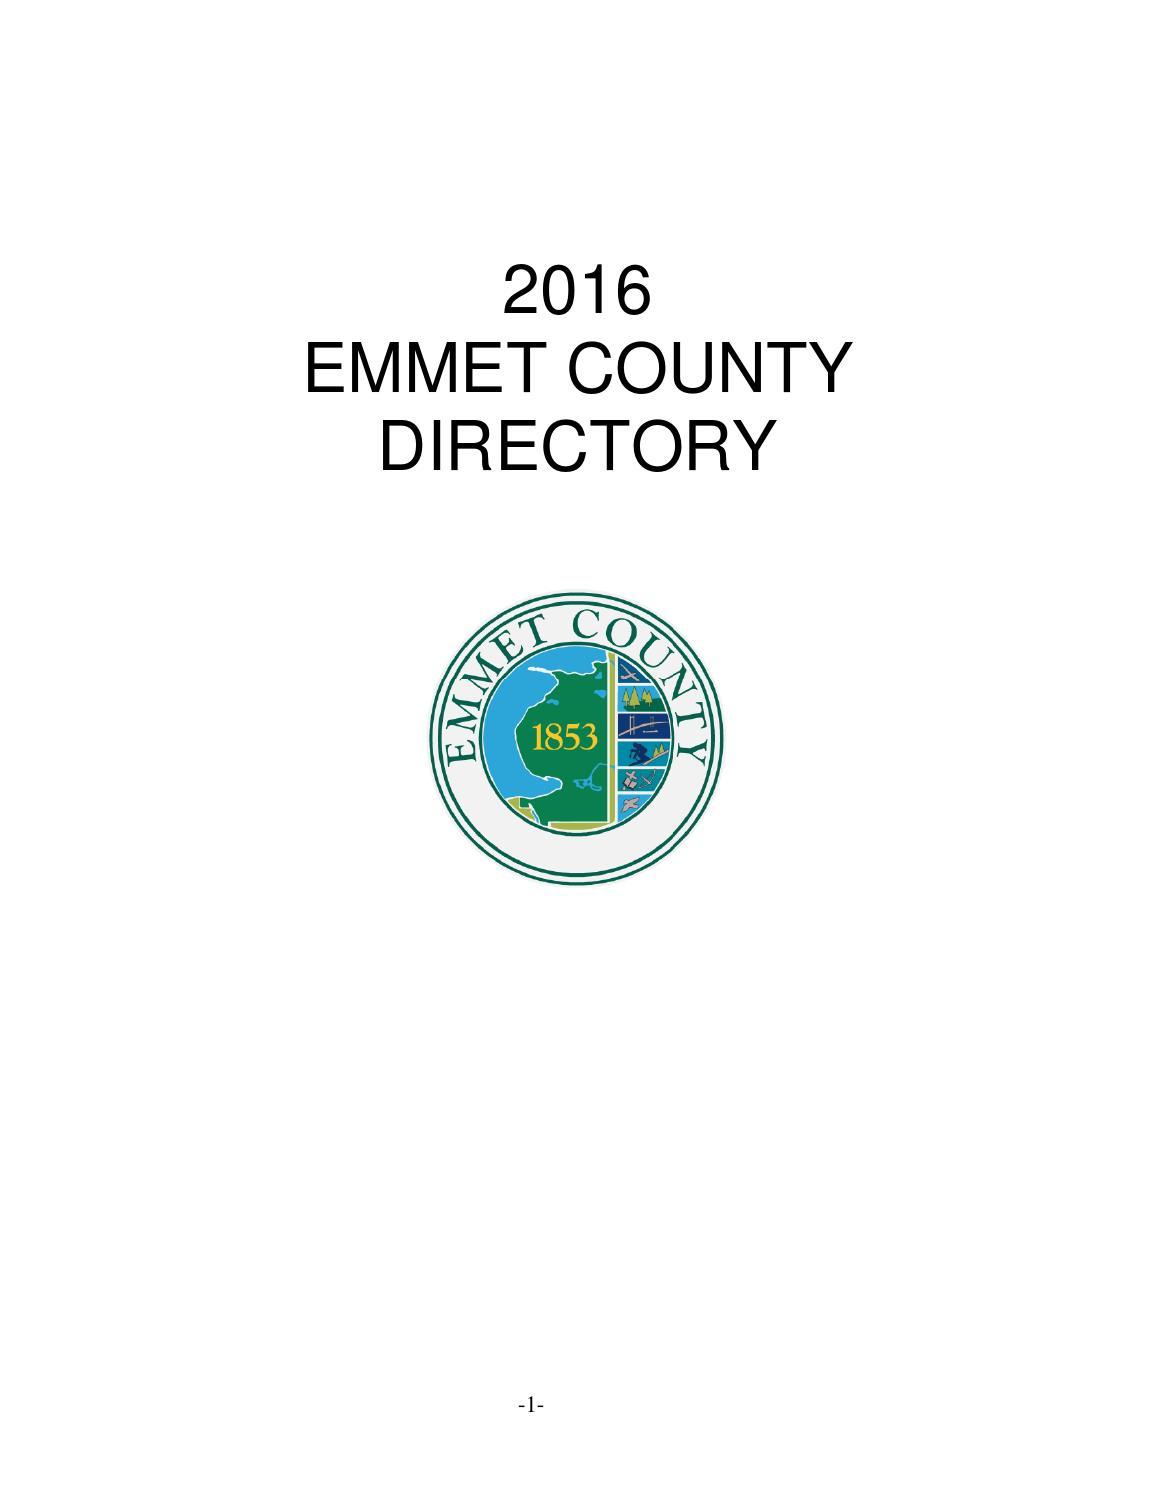 Michigan emmet county levering - Michigan Emmet County Levering 78